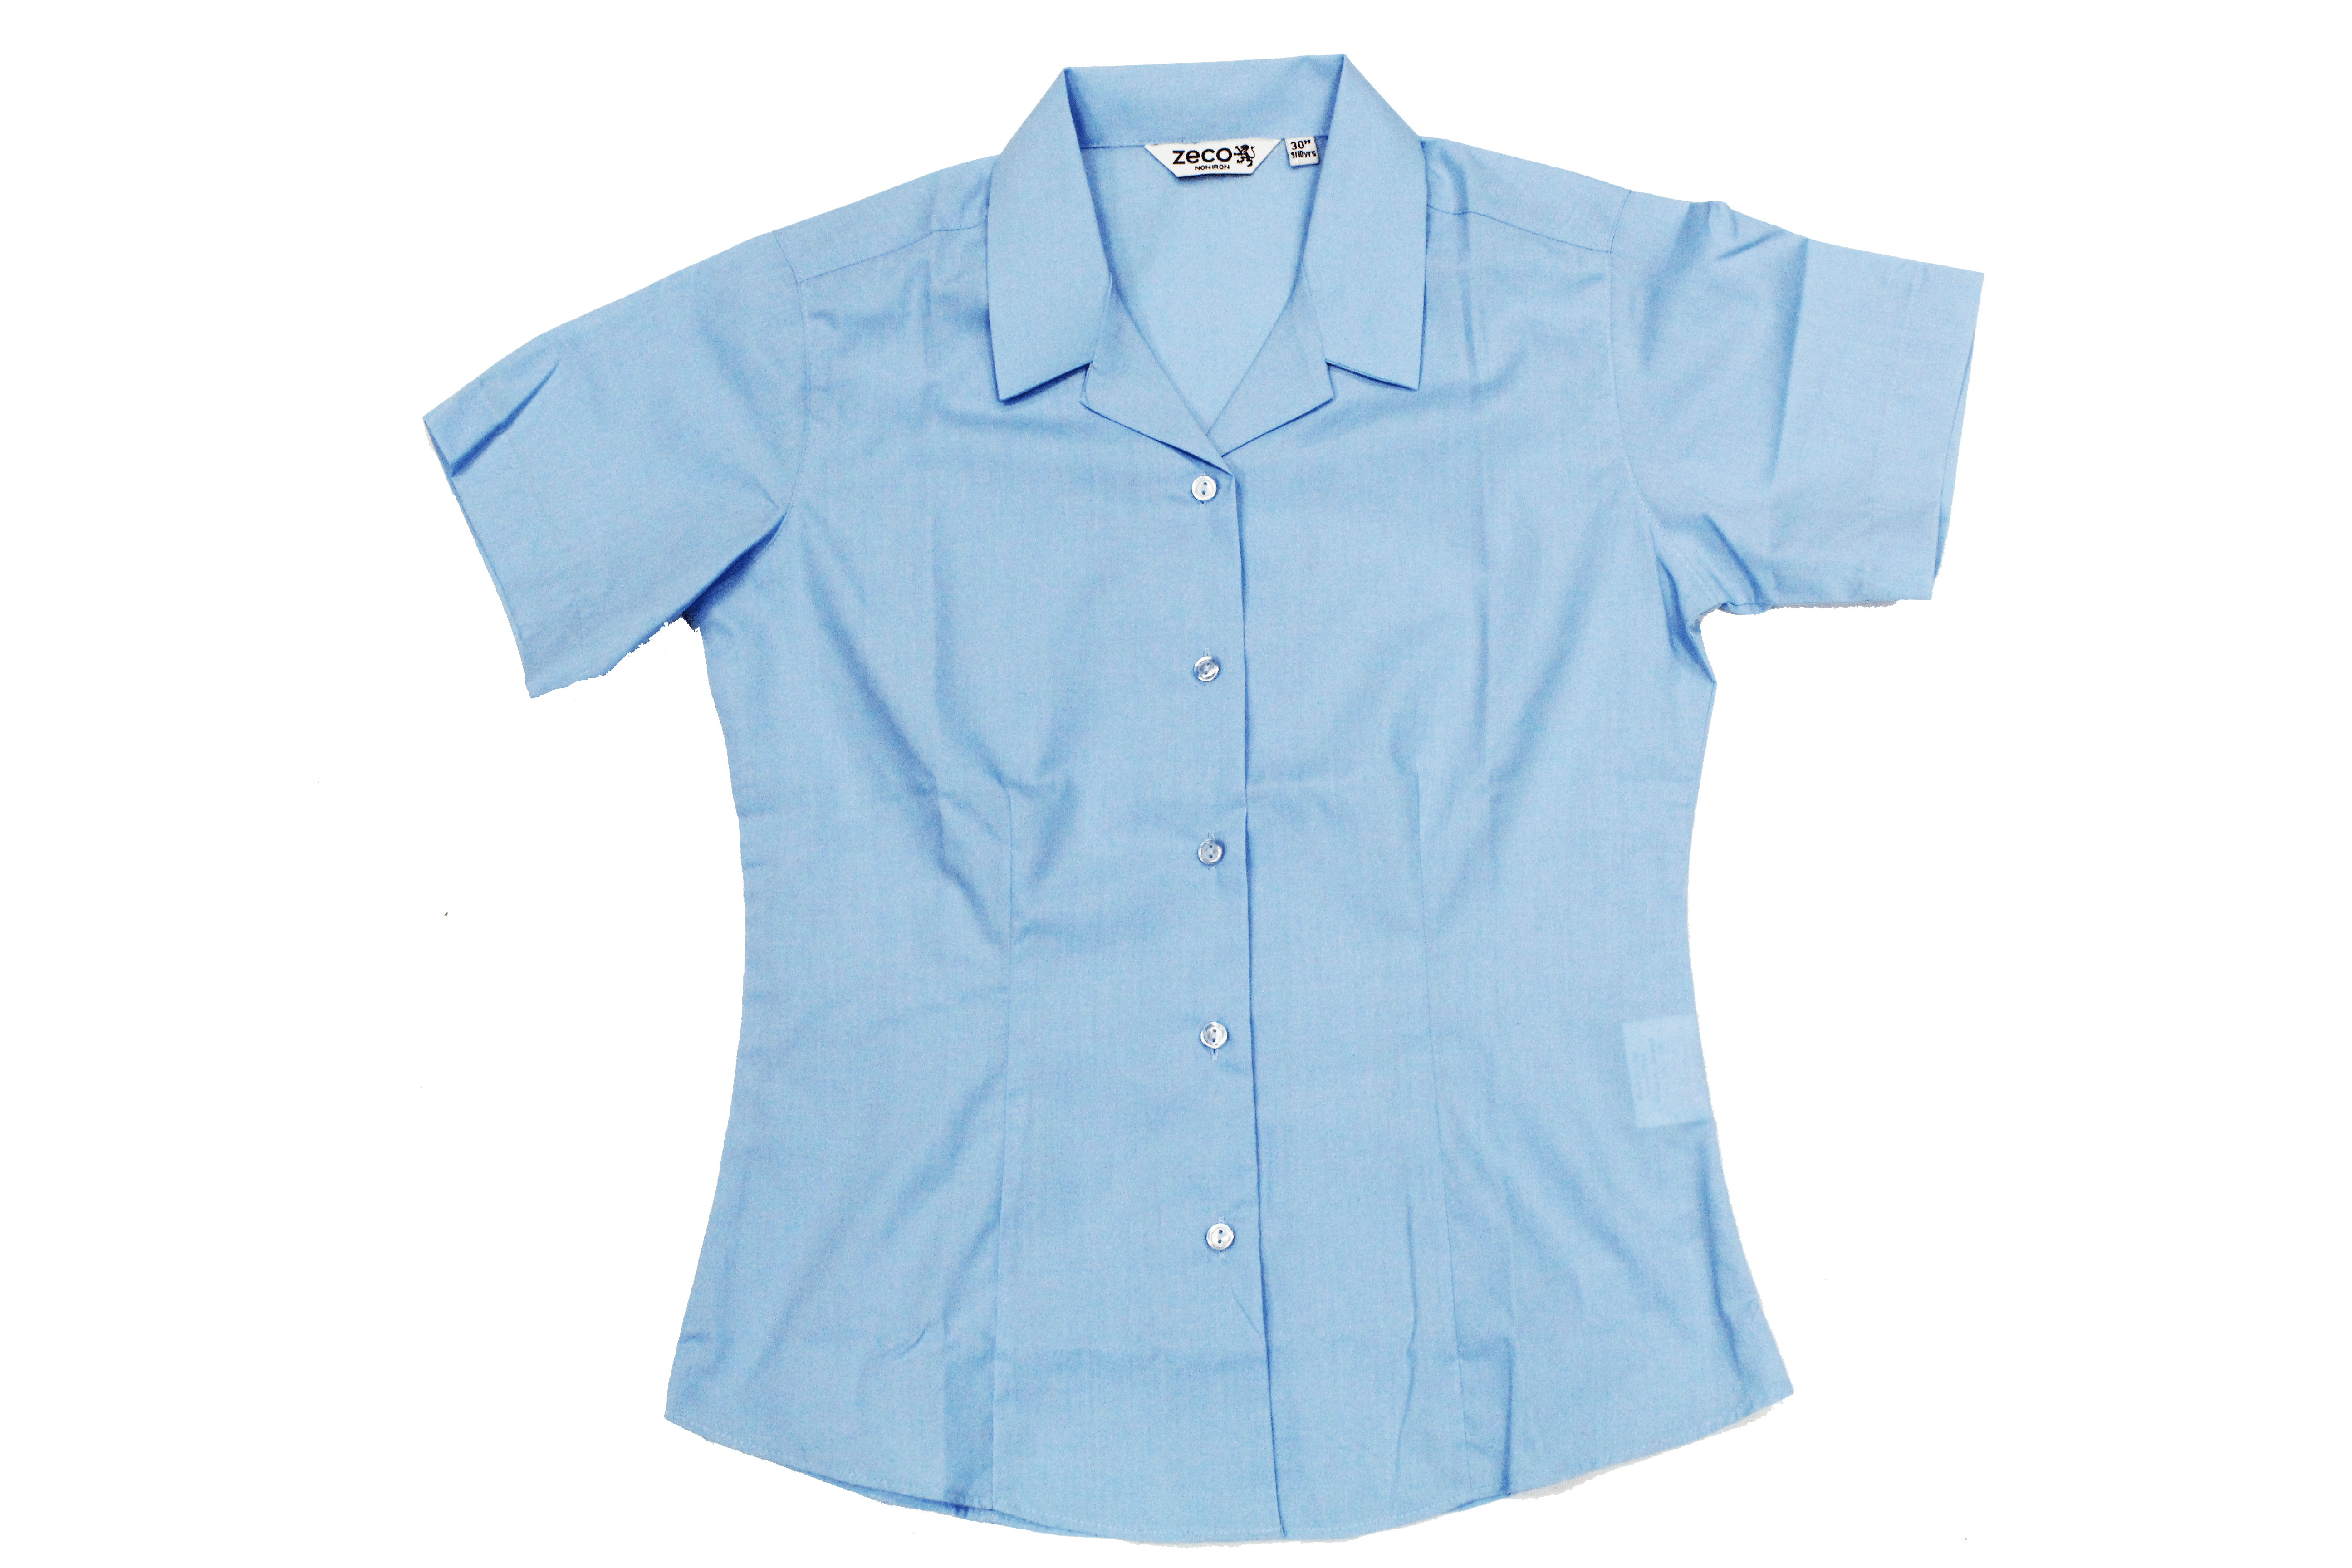 SGA - Fitted Short Sleeve blue Girls Blouse